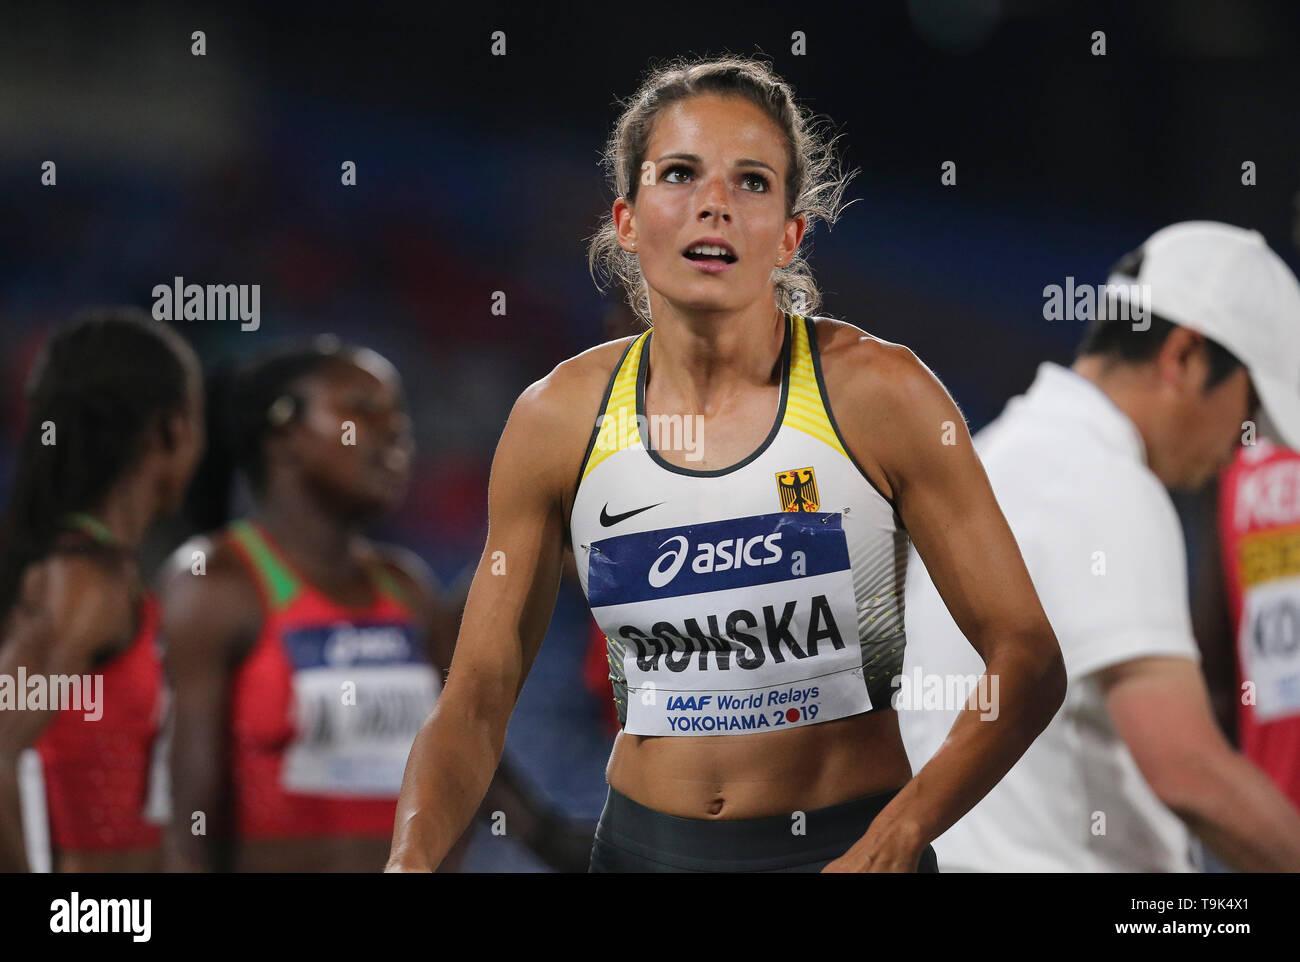 YOKOHAMA, JAPAN - MAY 10: Nadine Gonska of Germany during Day 1 of the 2019 IAAF World Relay Championships at the Nissan Stadium on Saturday May 11, 2019 in Yokohama, Japan. (Photo by Roger Sedres for the IAAF) - Stock Image